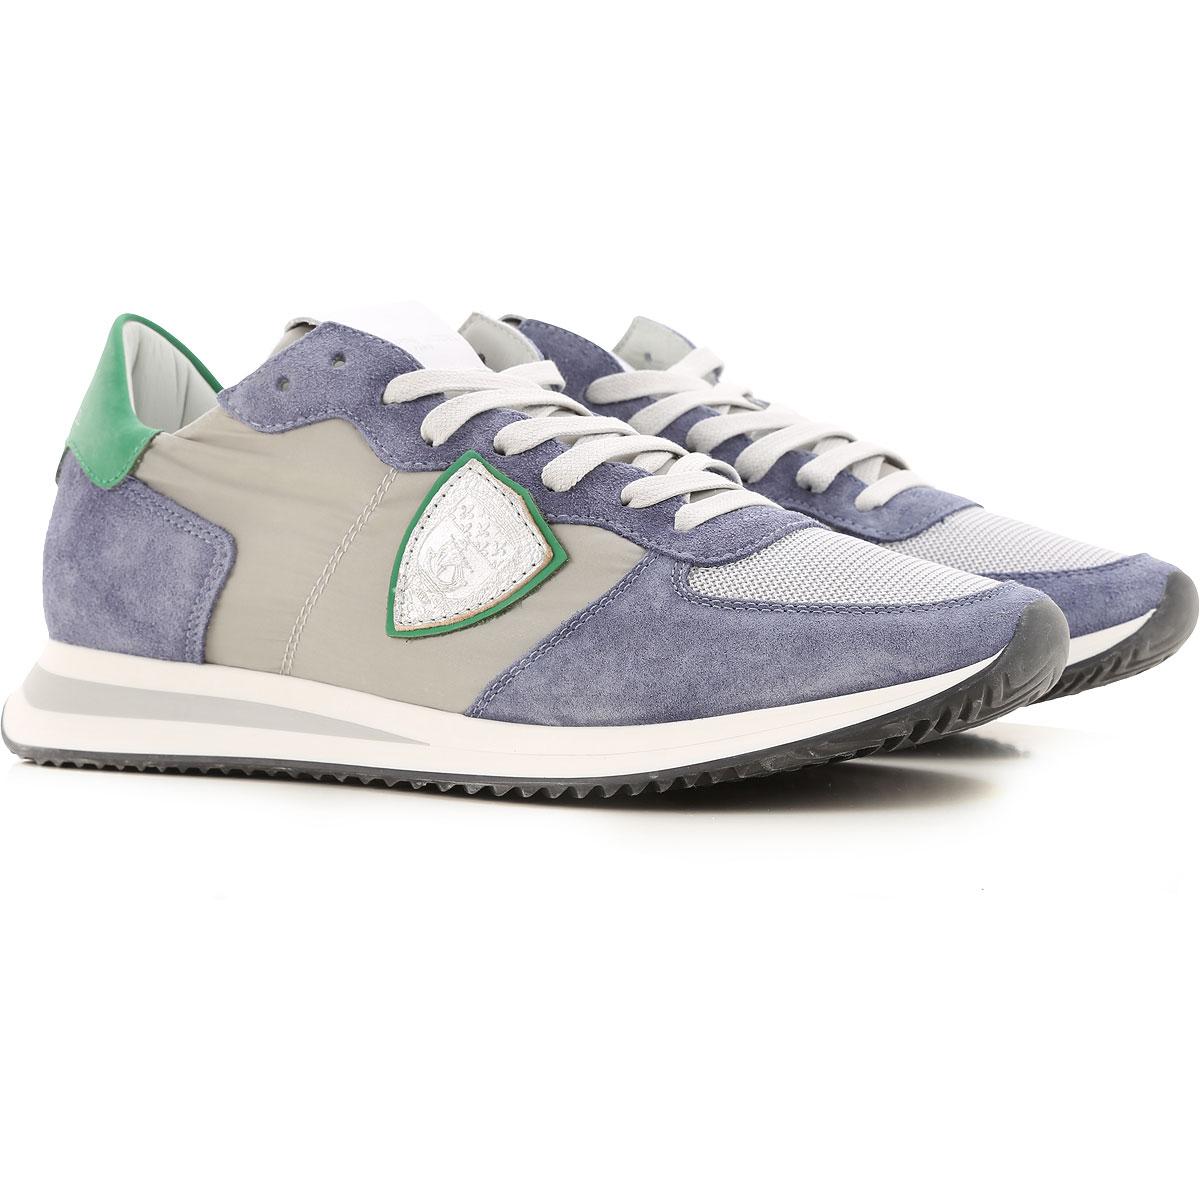 Philippe Model Sneakers for Men On Sale, Grey, Nylon, 2019, 10 10.5 11.5 7.5 8 9